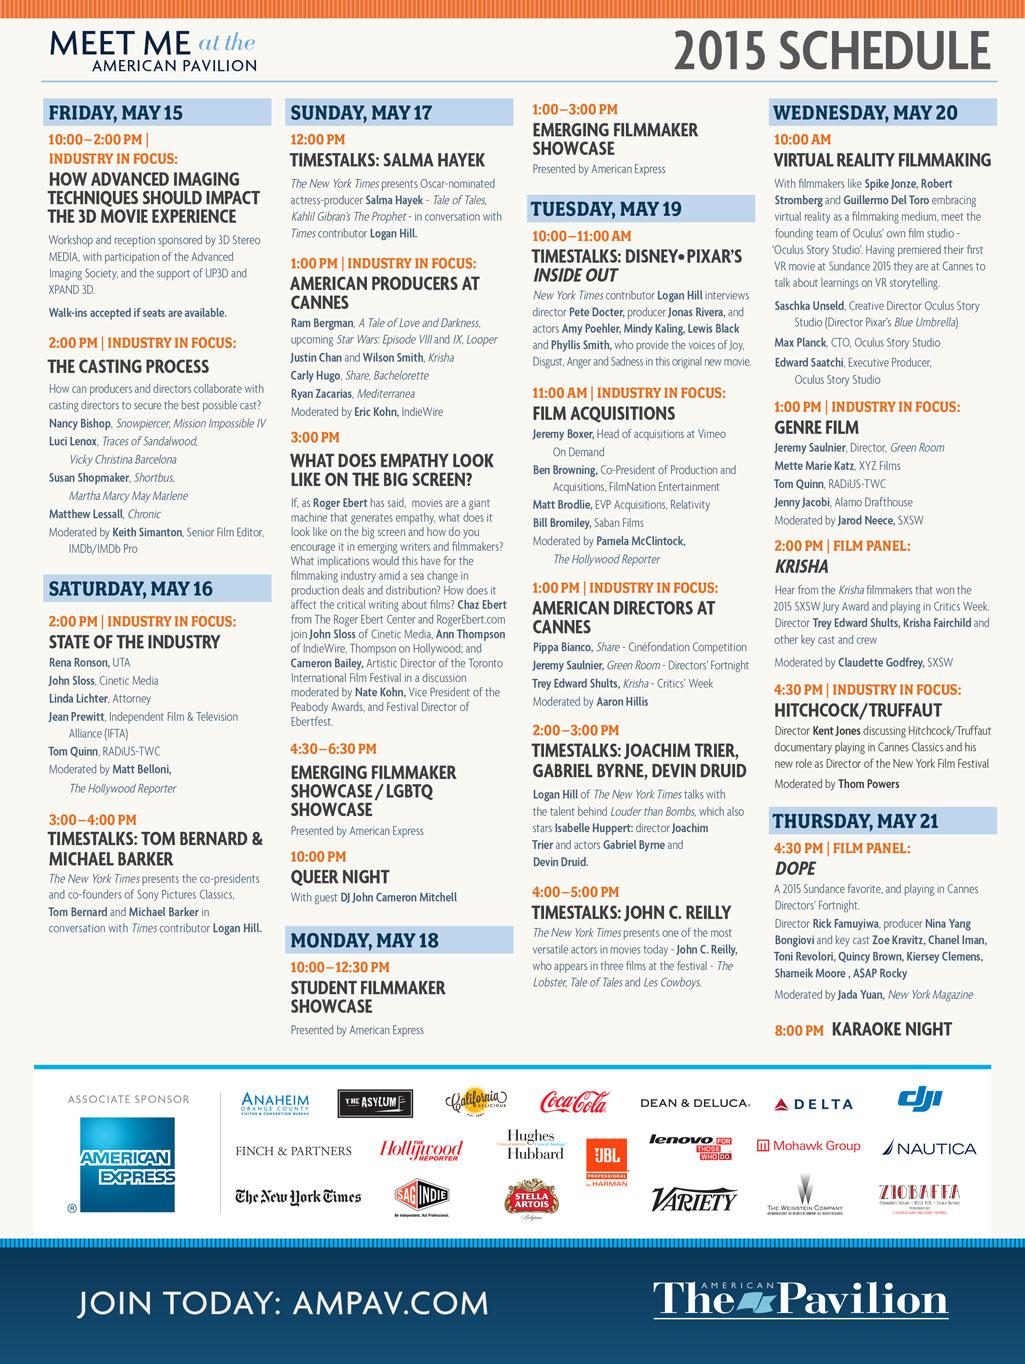 American Pavillion Schedule 2015